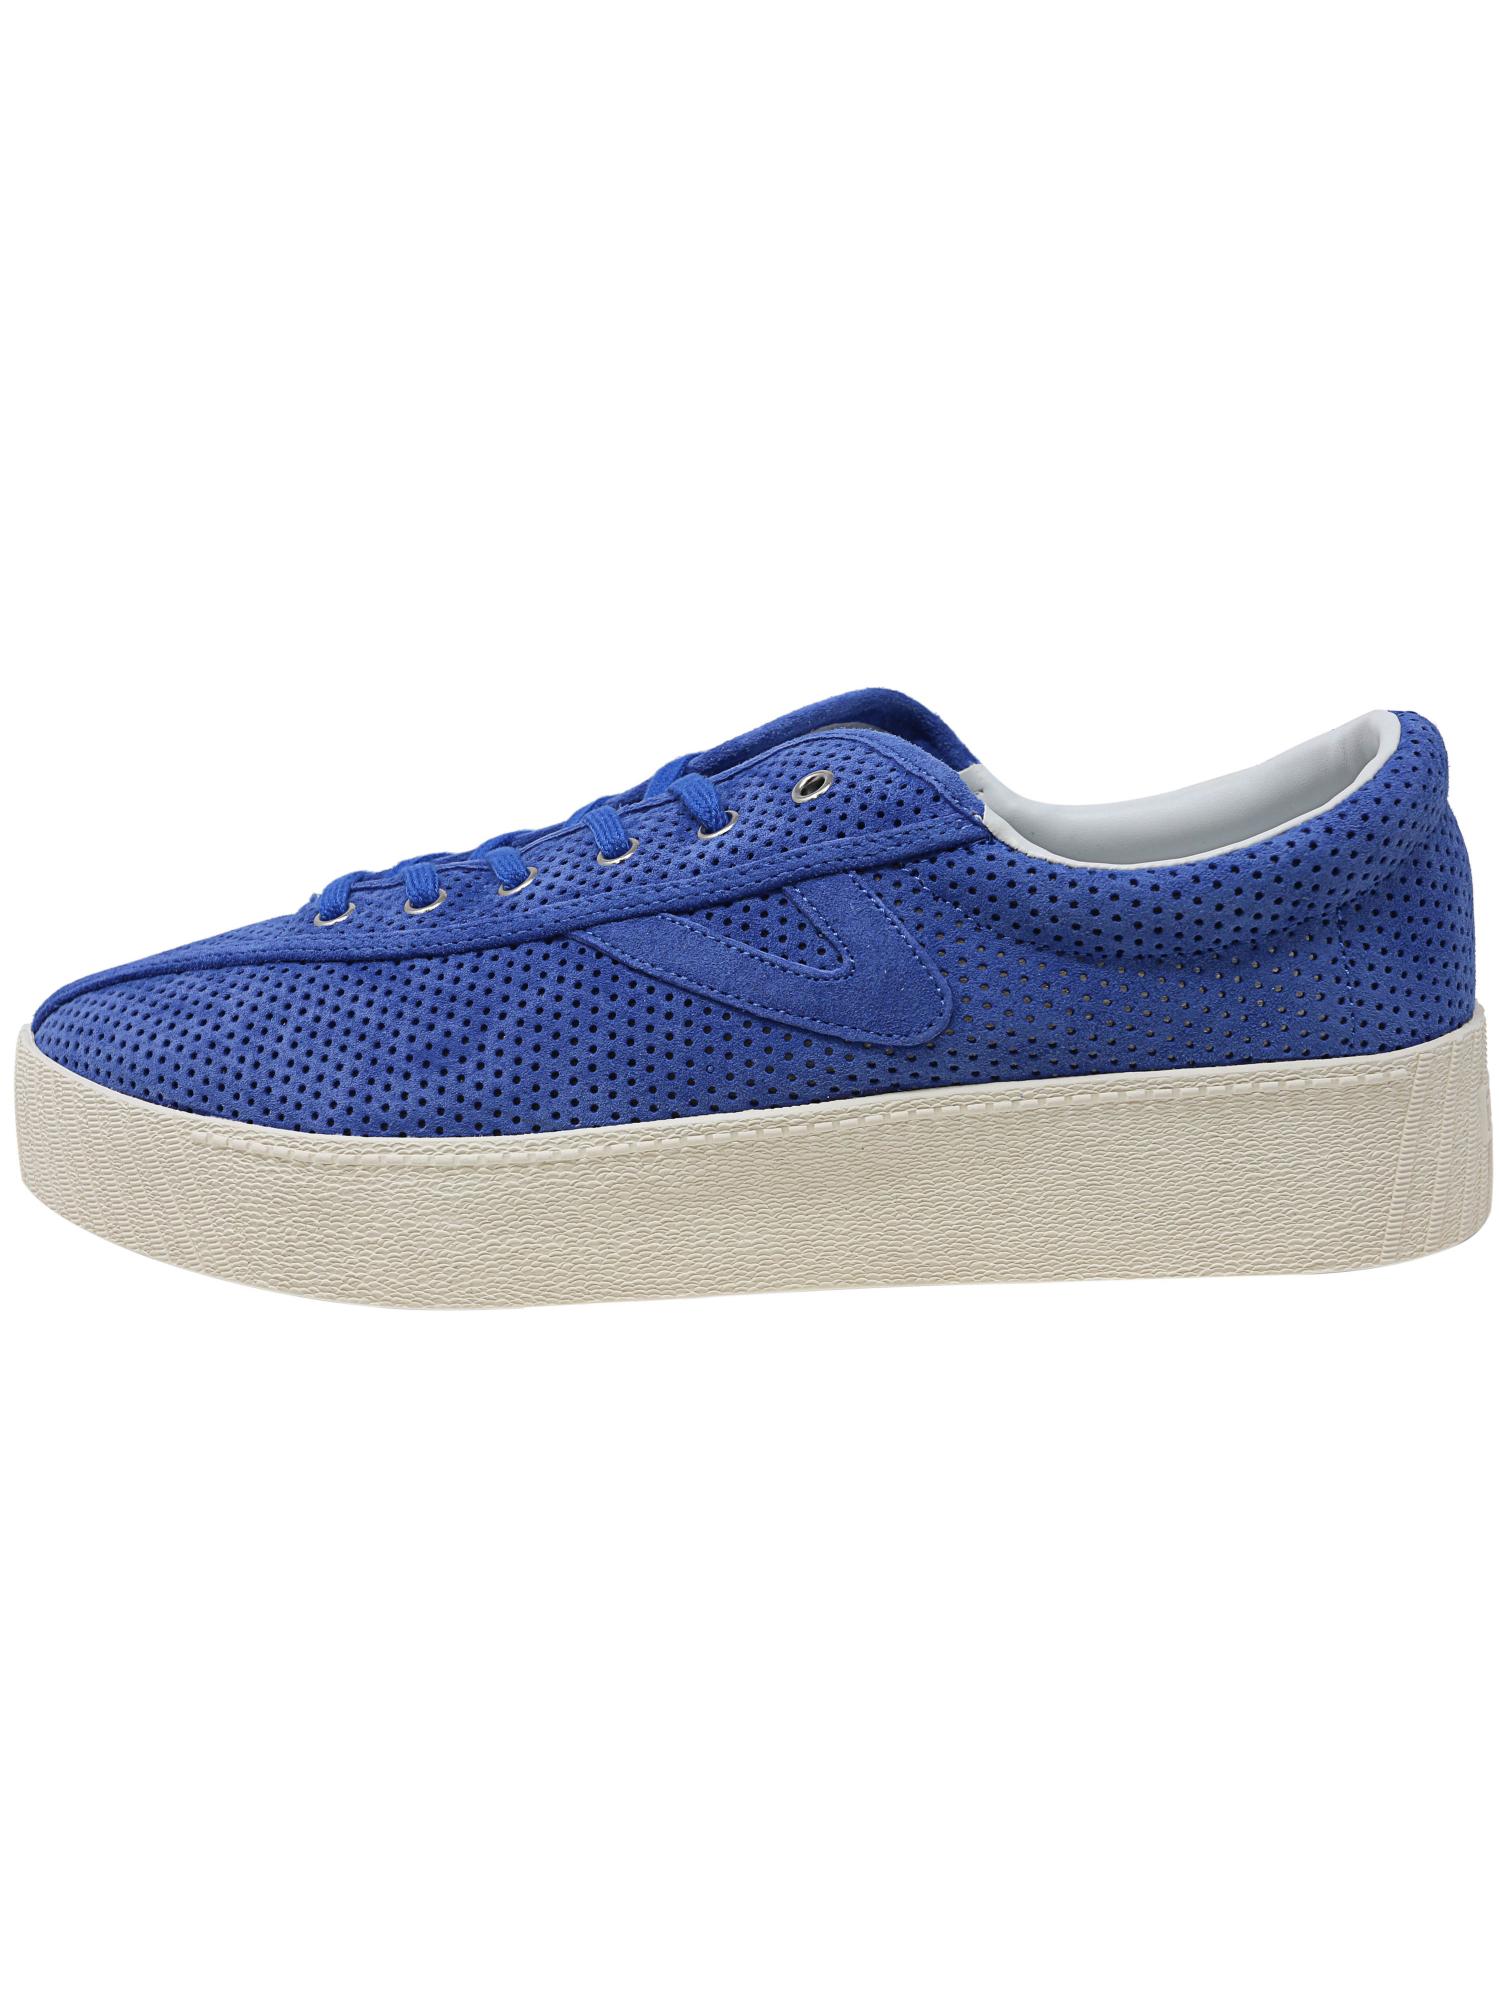 Tretorn-Nylite-3-Bold-Suede-Fashion-Sneaker thumbnail 5